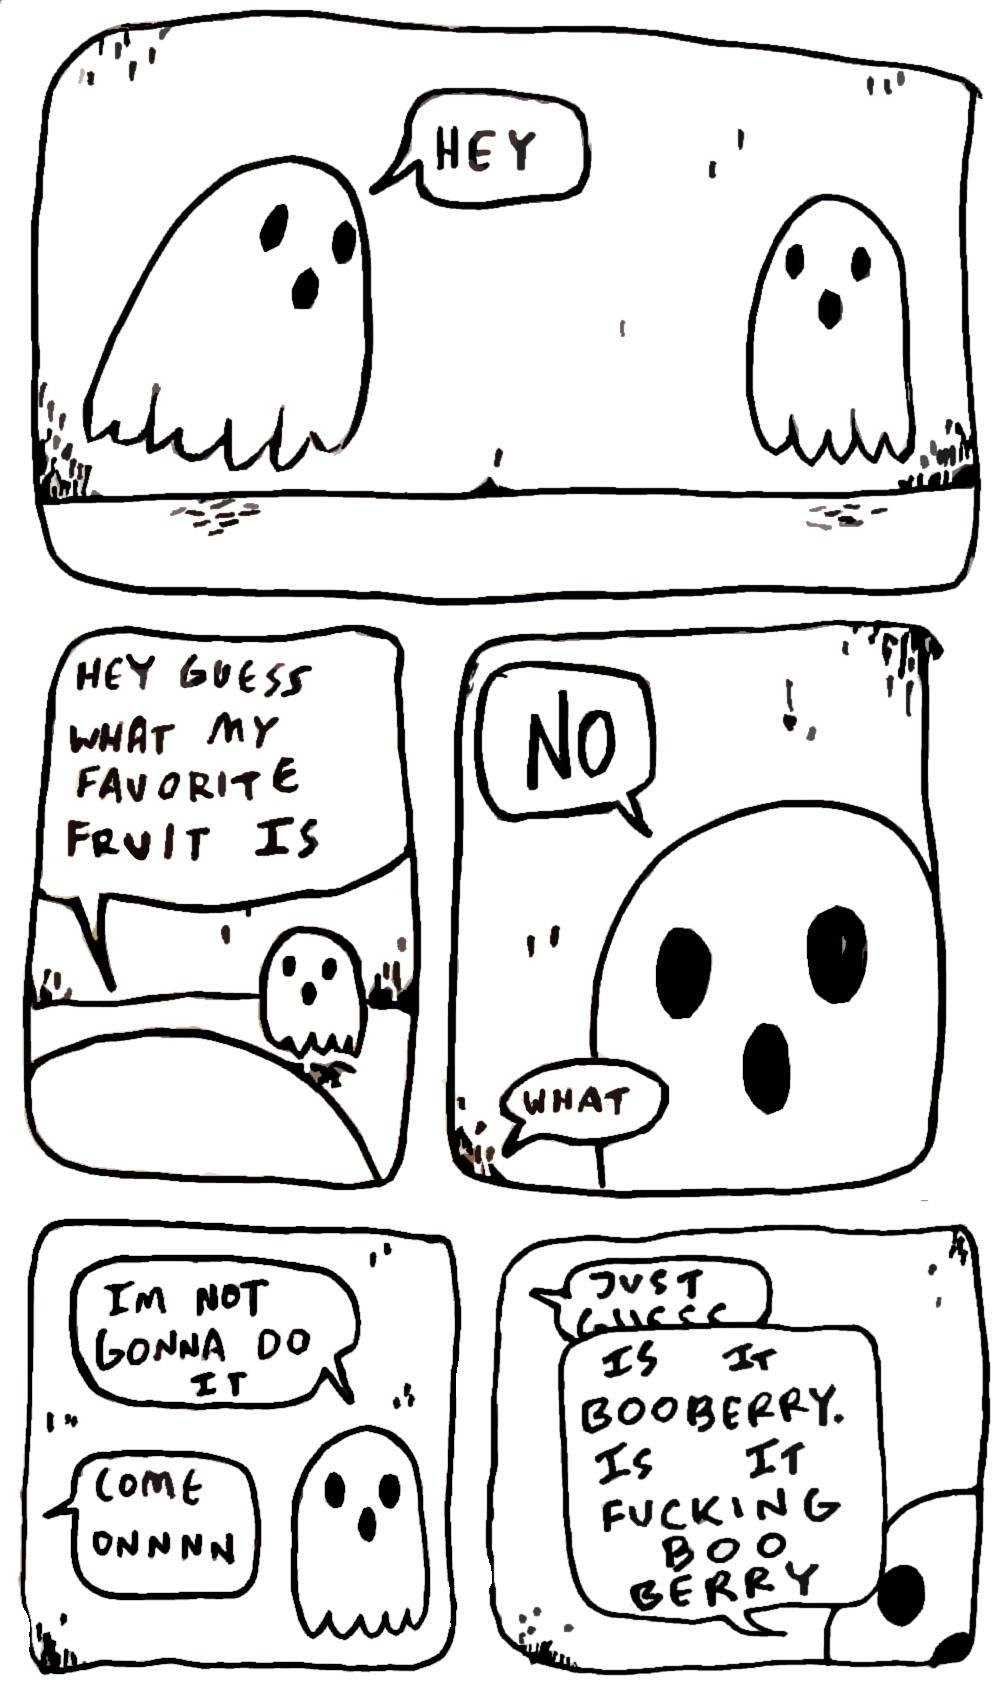 ghosts, jokes, humor, illustrations, Halloween, fall